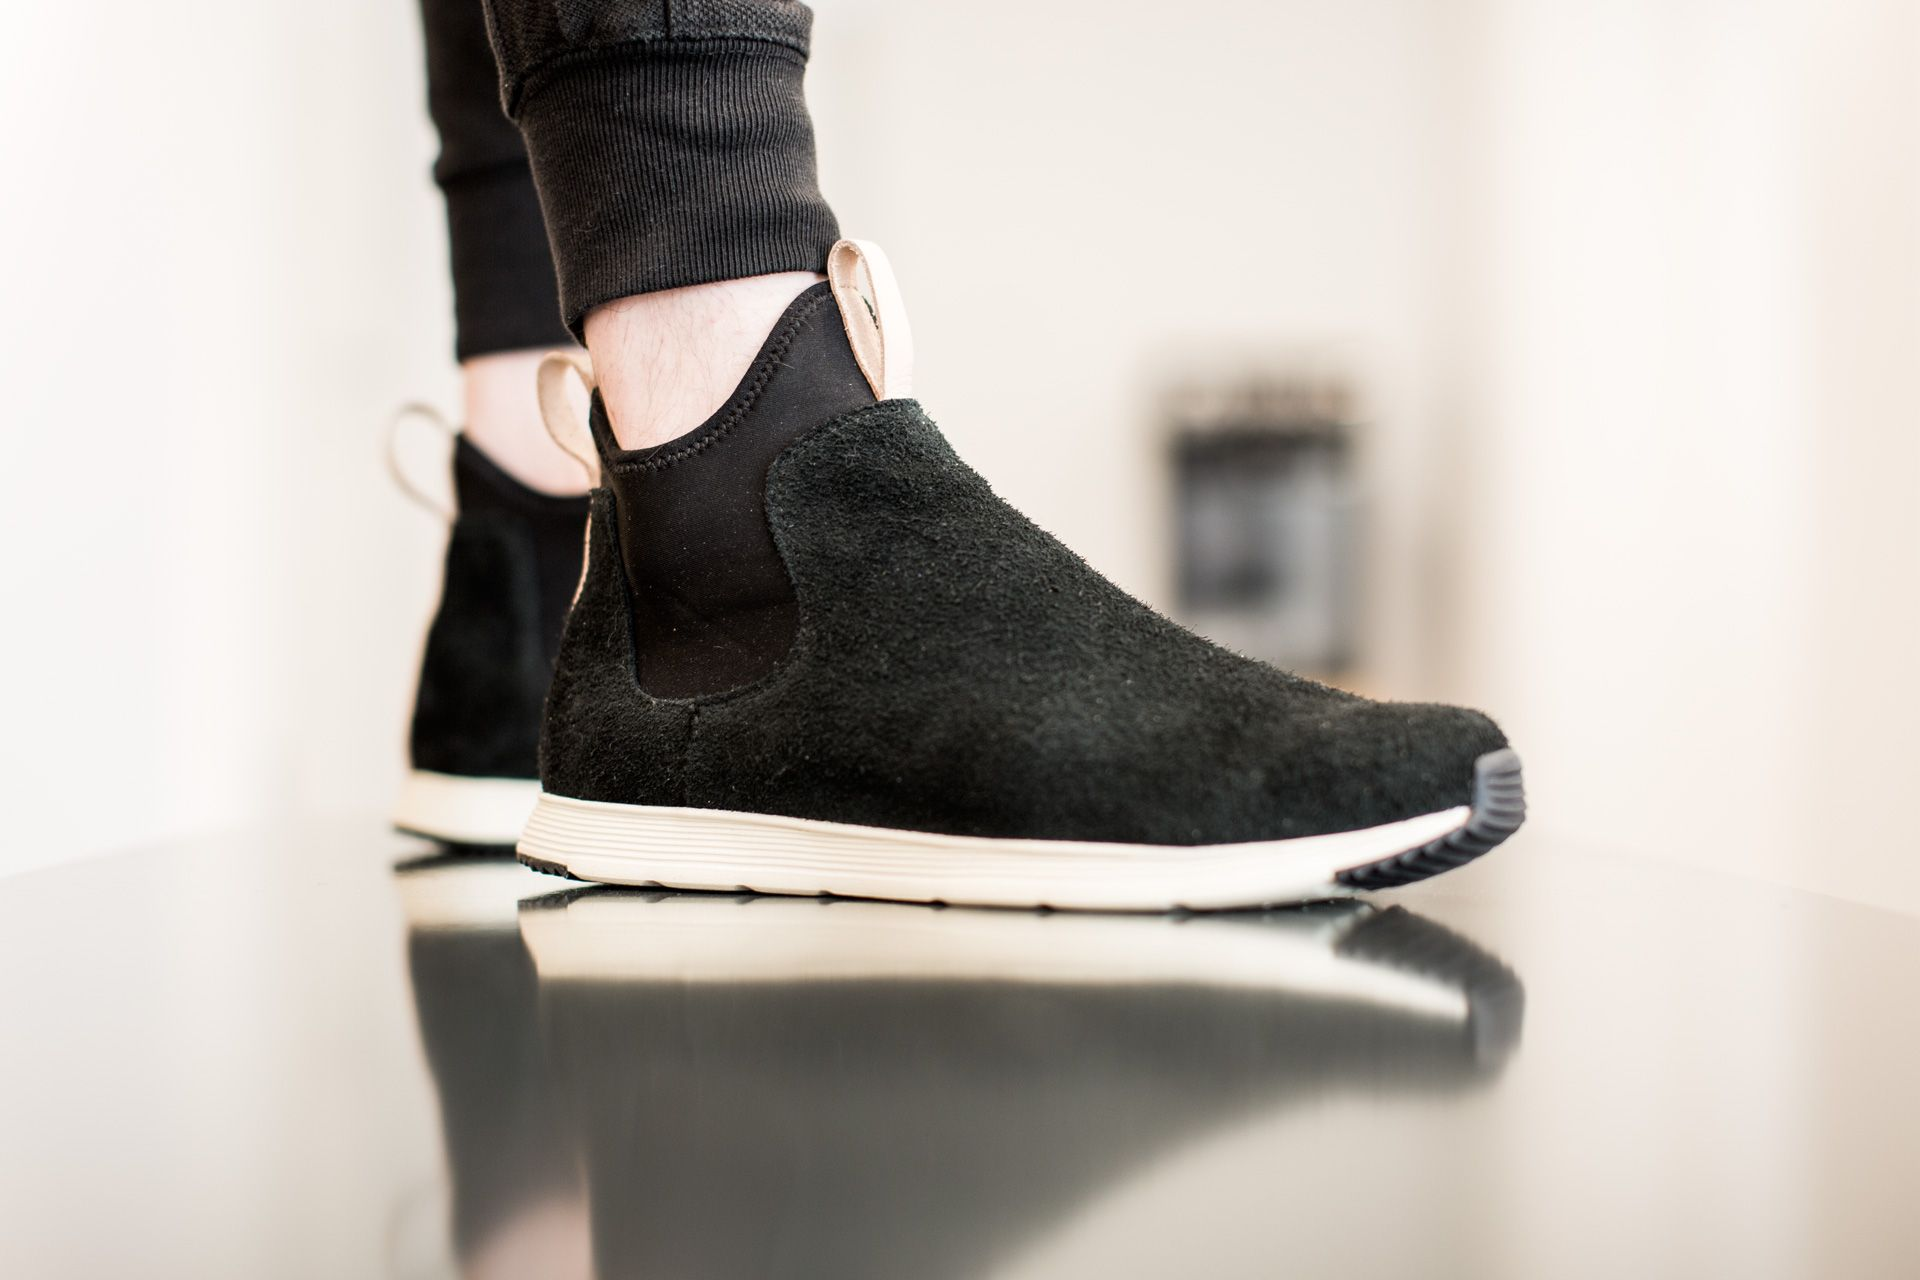 RANSOM BROHM LITE BLACK/BONE available at www.tint-footwear.com/